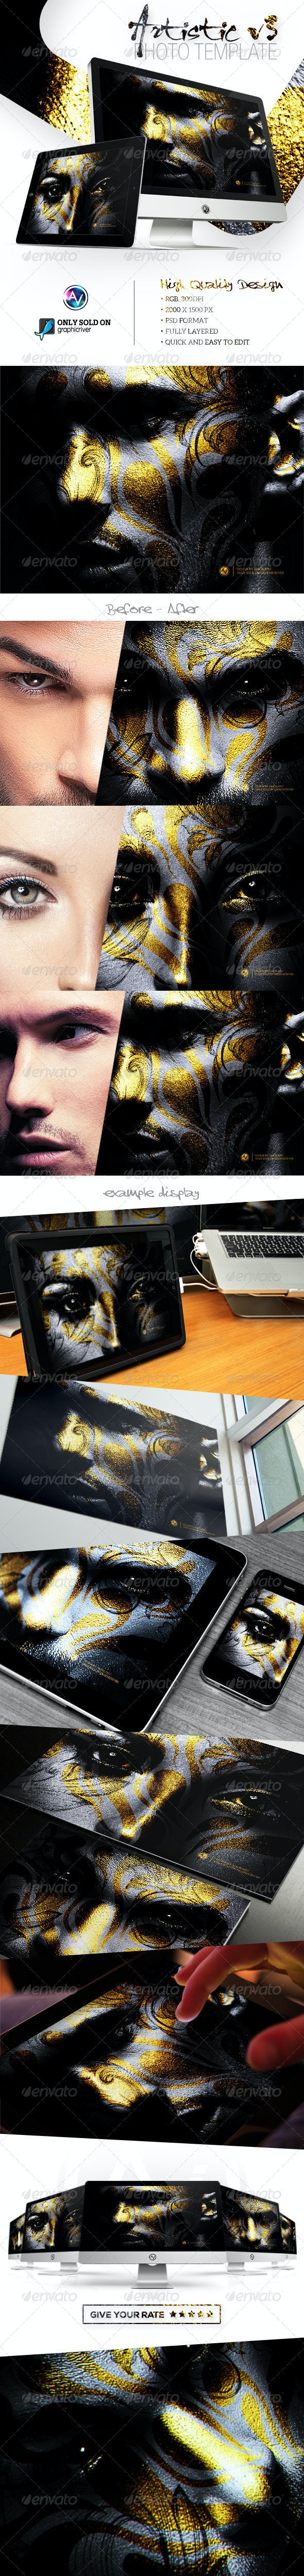 Artistic Photo Template V3 - Artistic Photo Templates